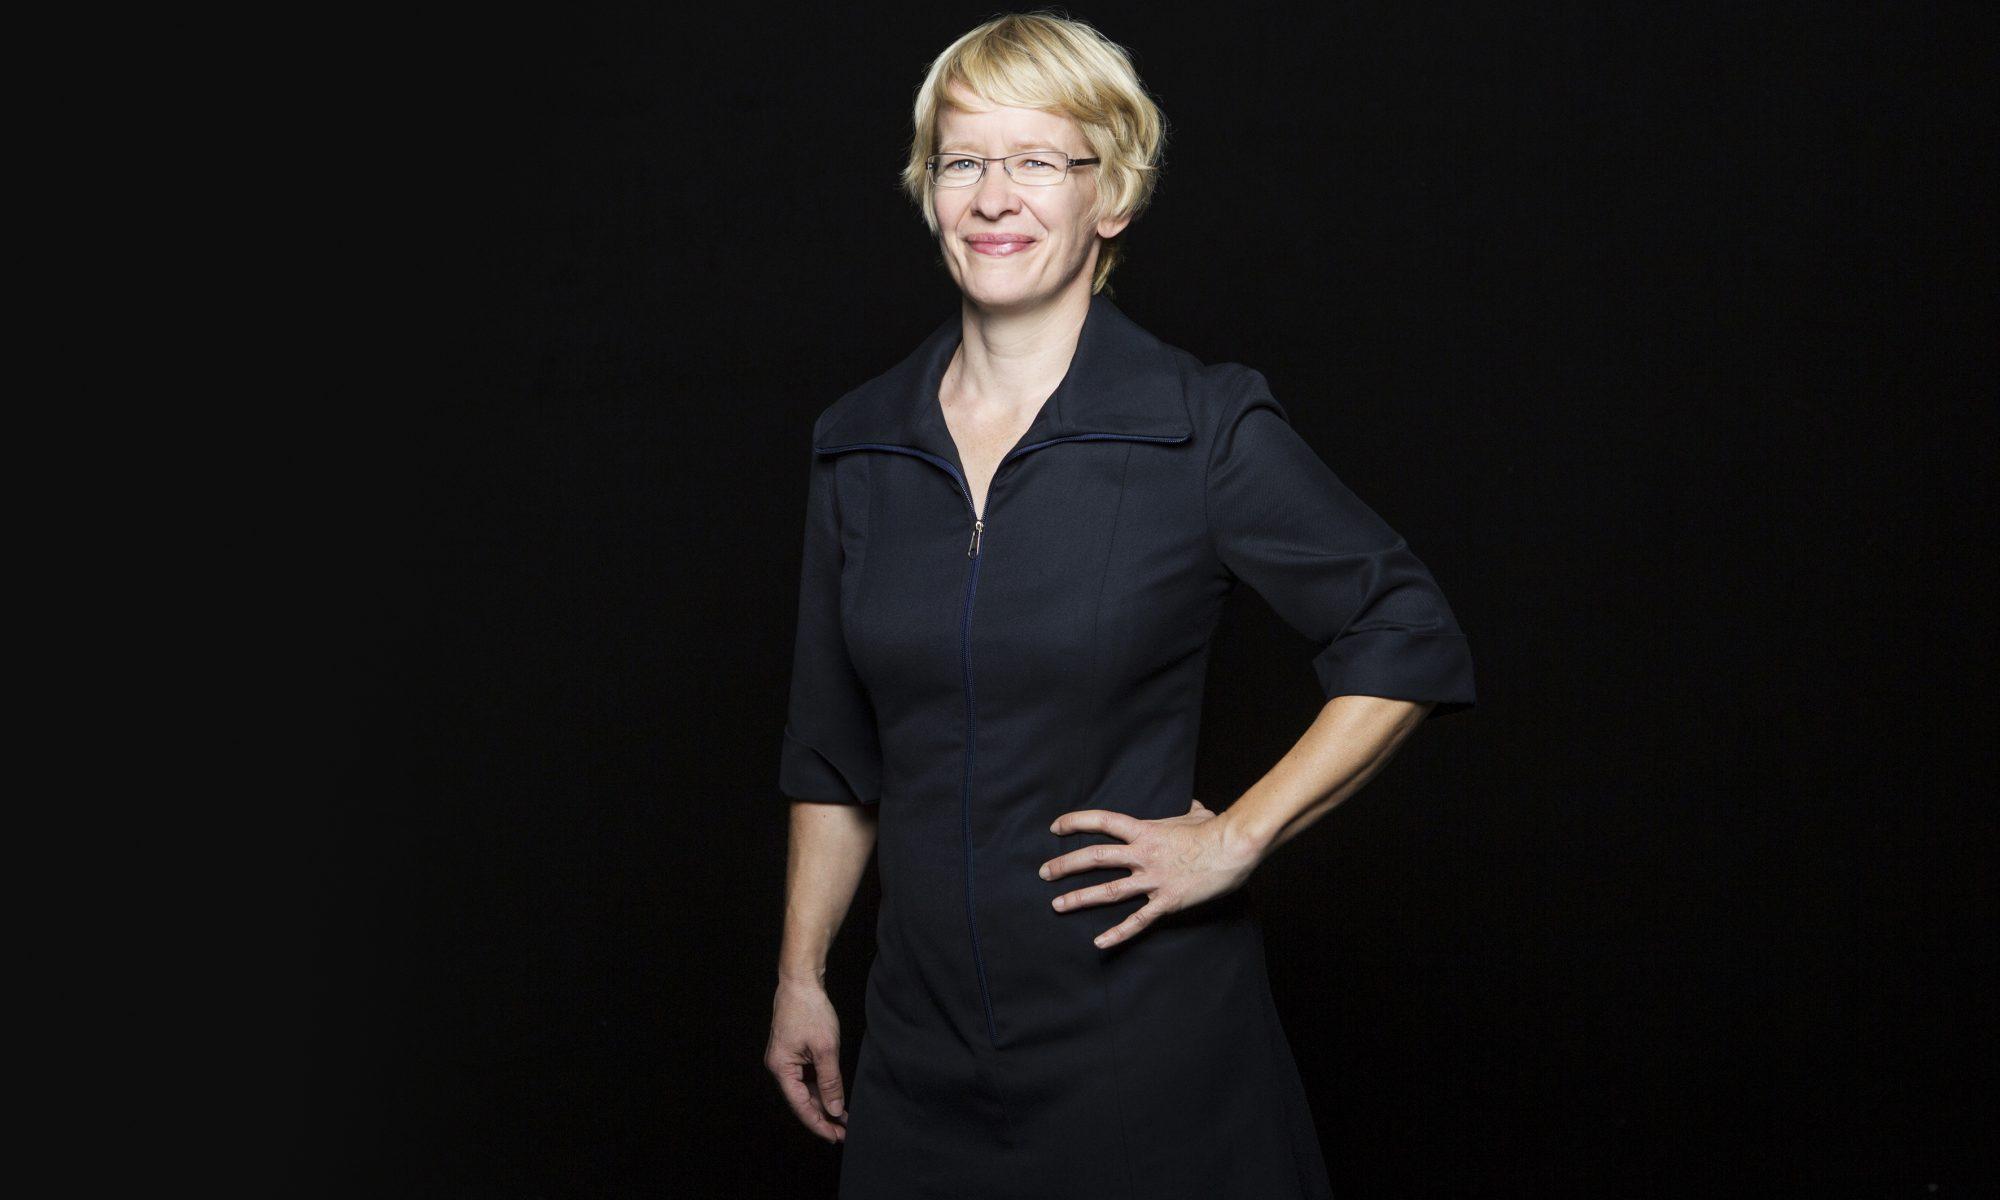 Eva Ullrich